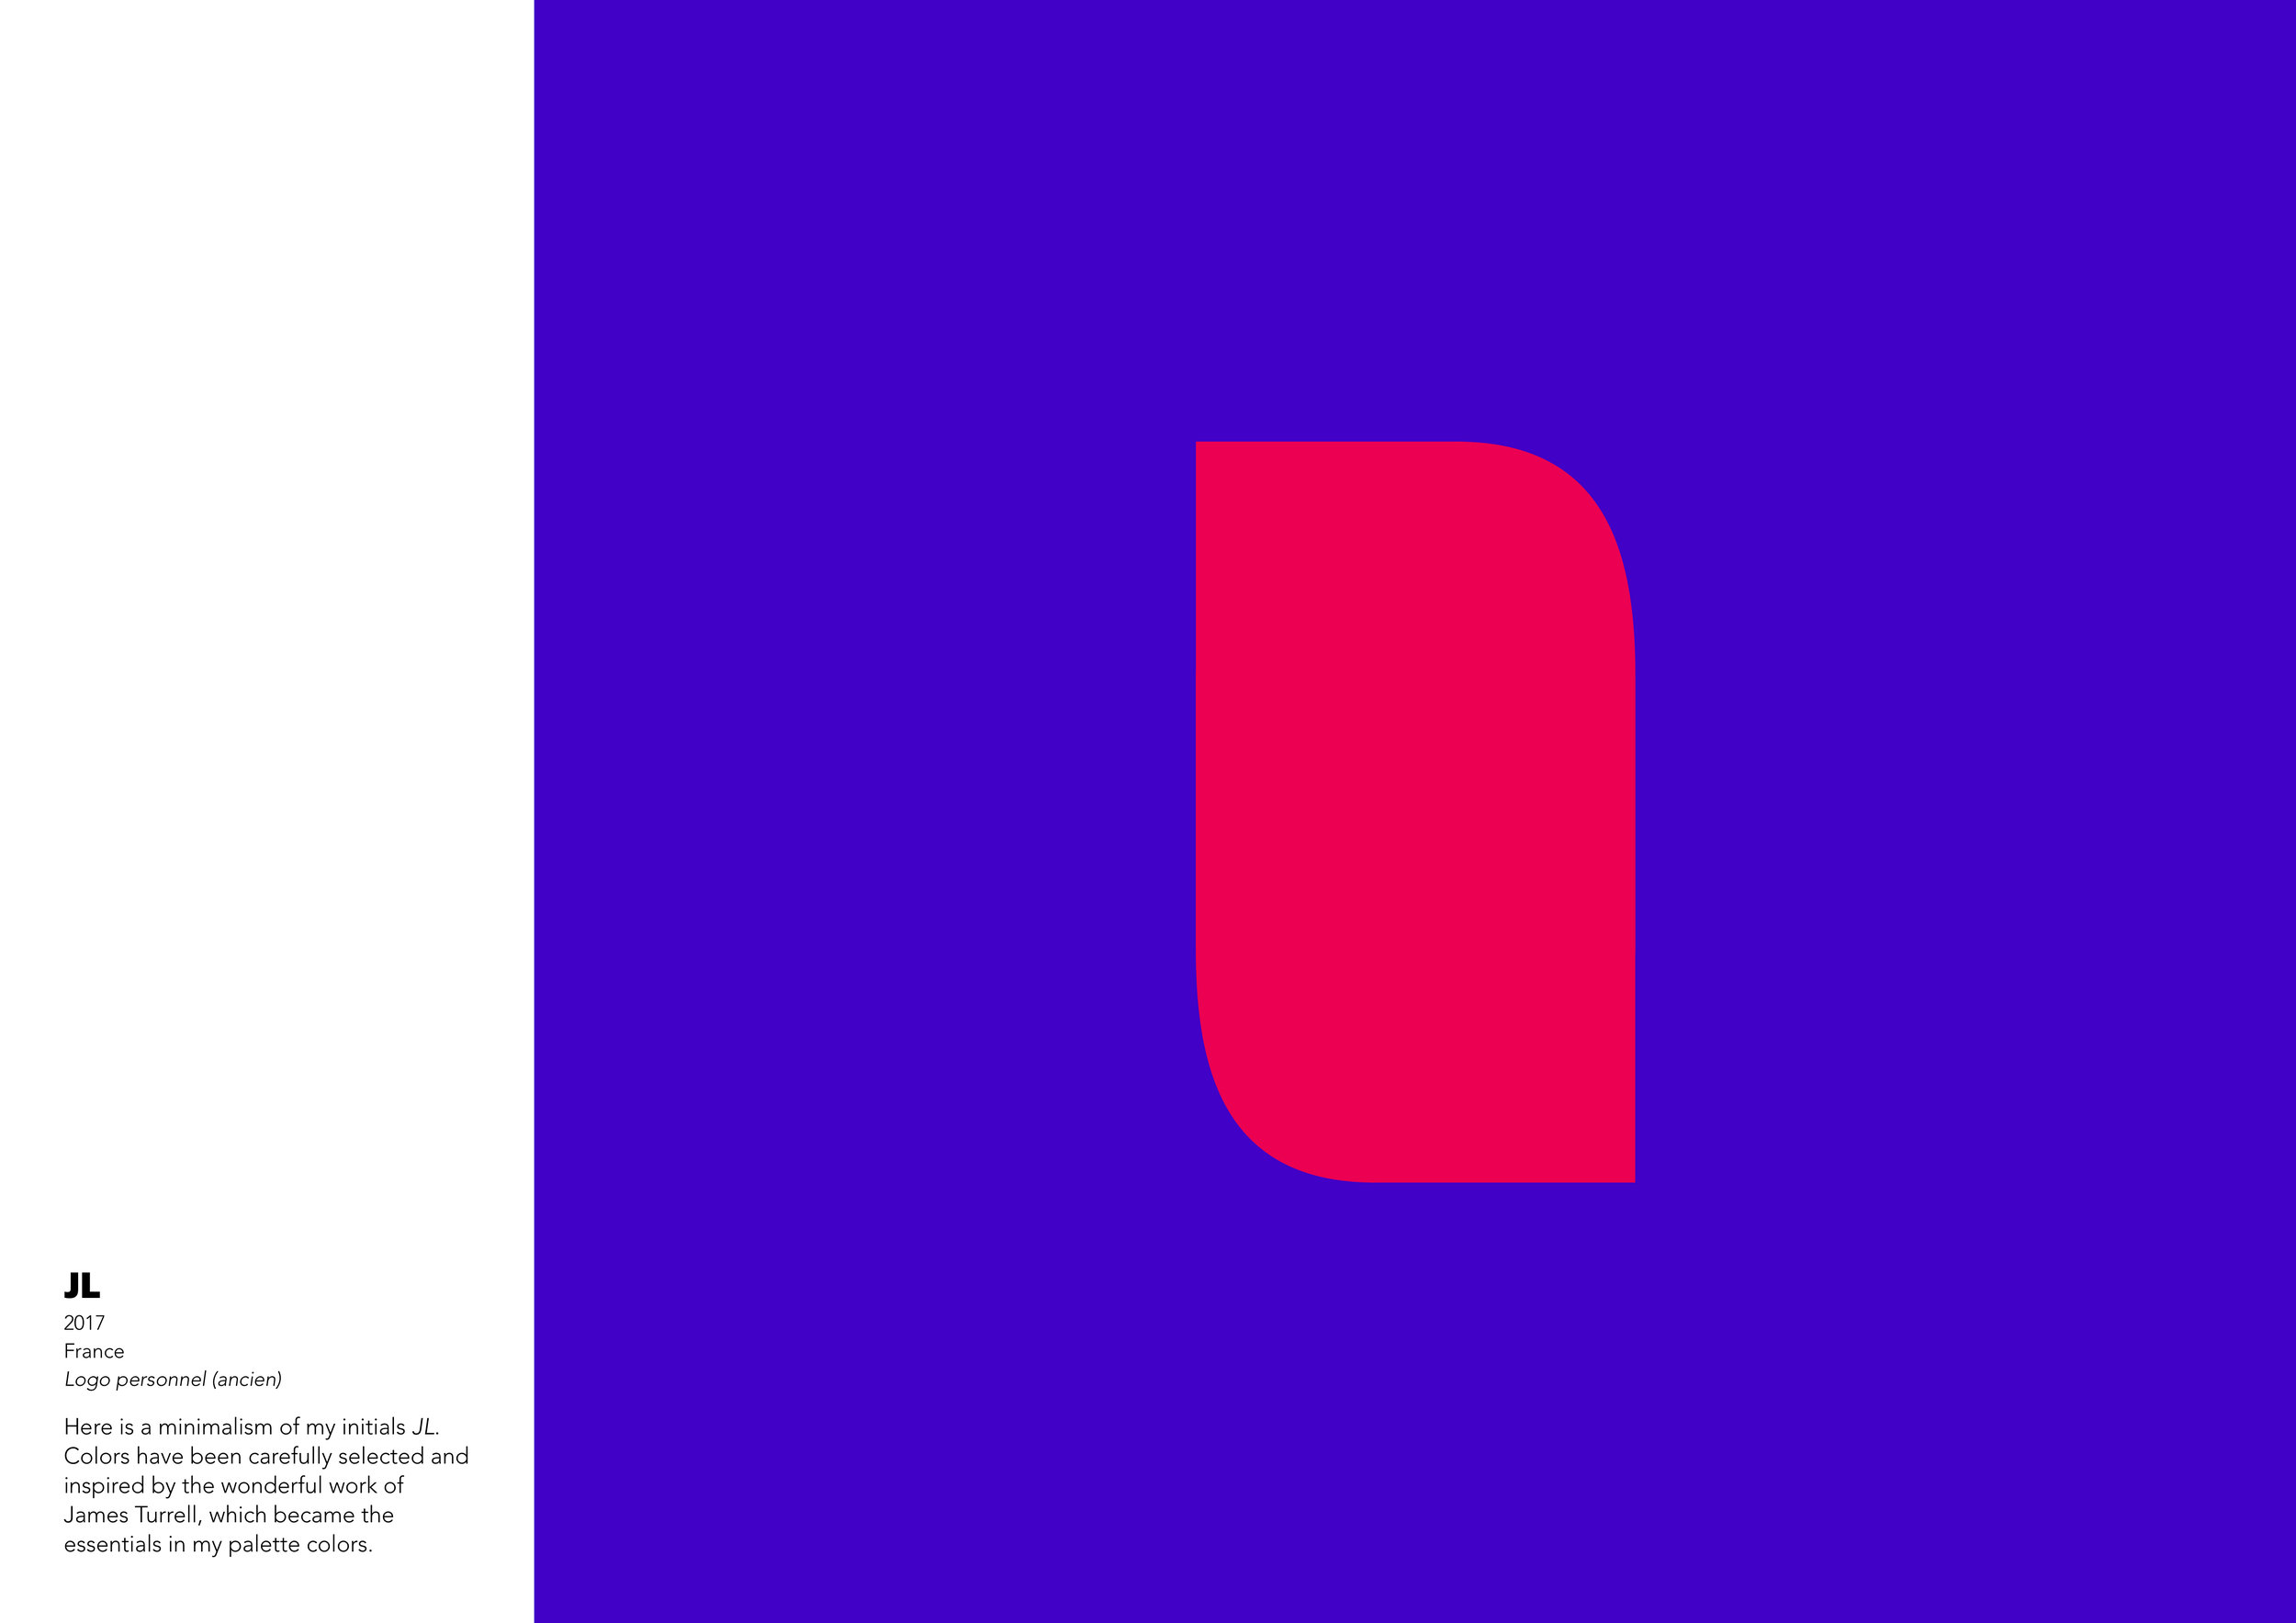 JL-monogram-joy-lasry-logo-design-minimalism.jpg